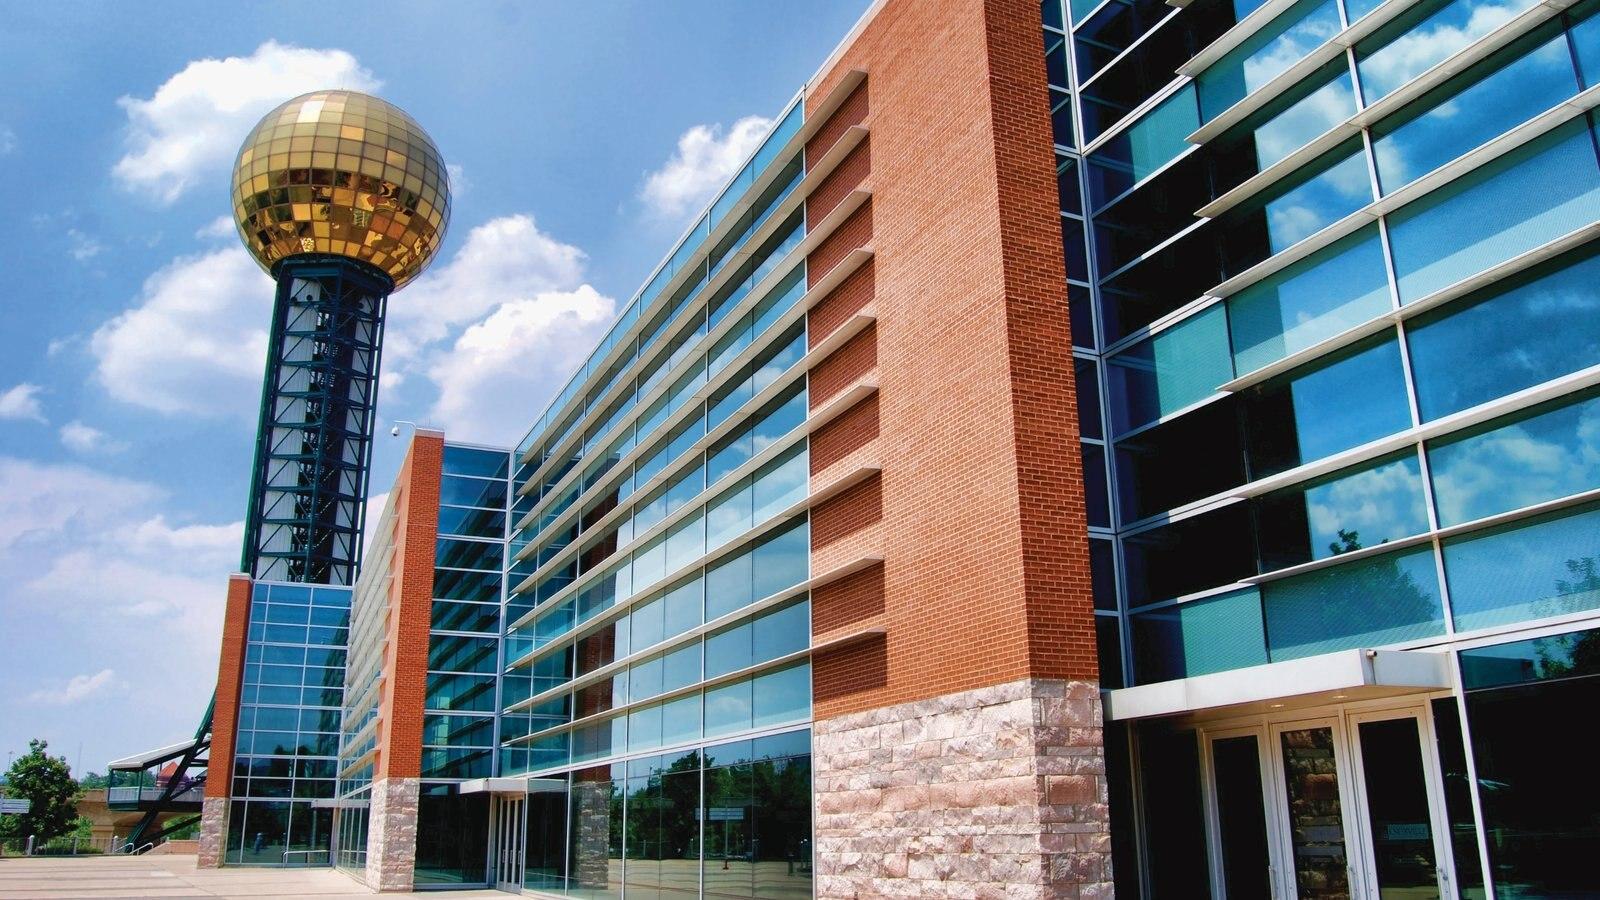 Knoxville caracterizando arquitetura moderna